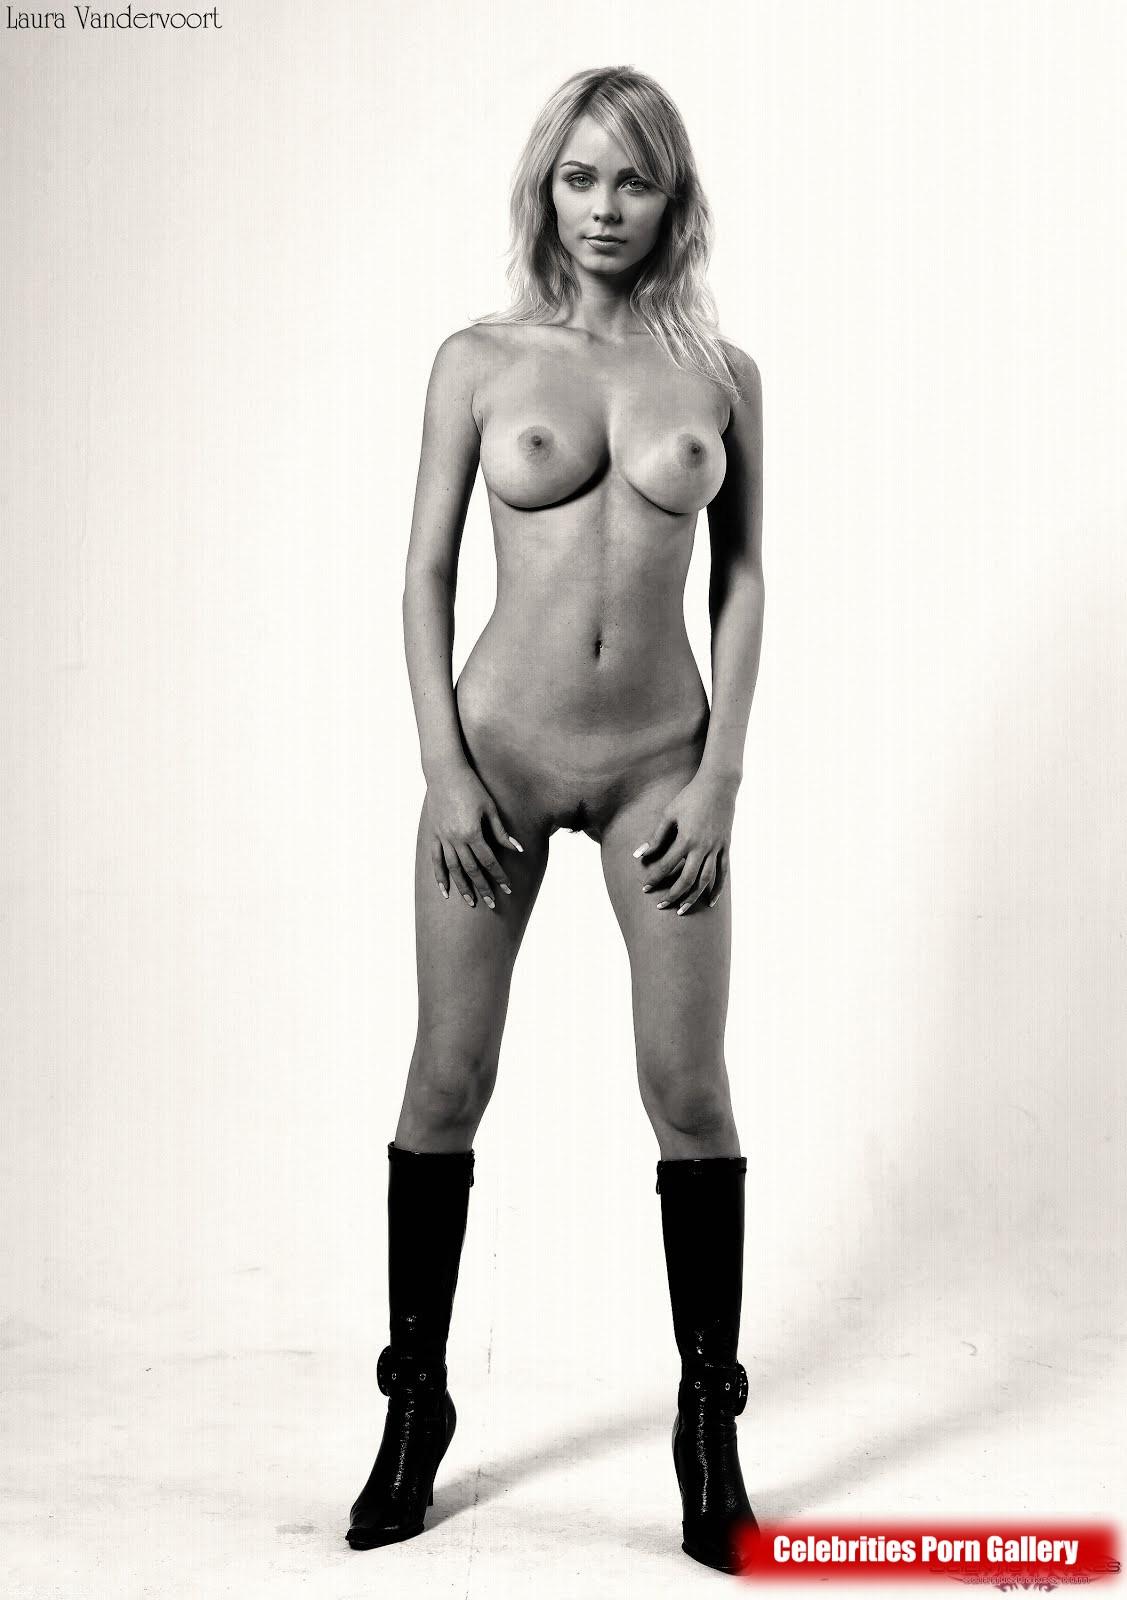 Most famous celebrity nudes